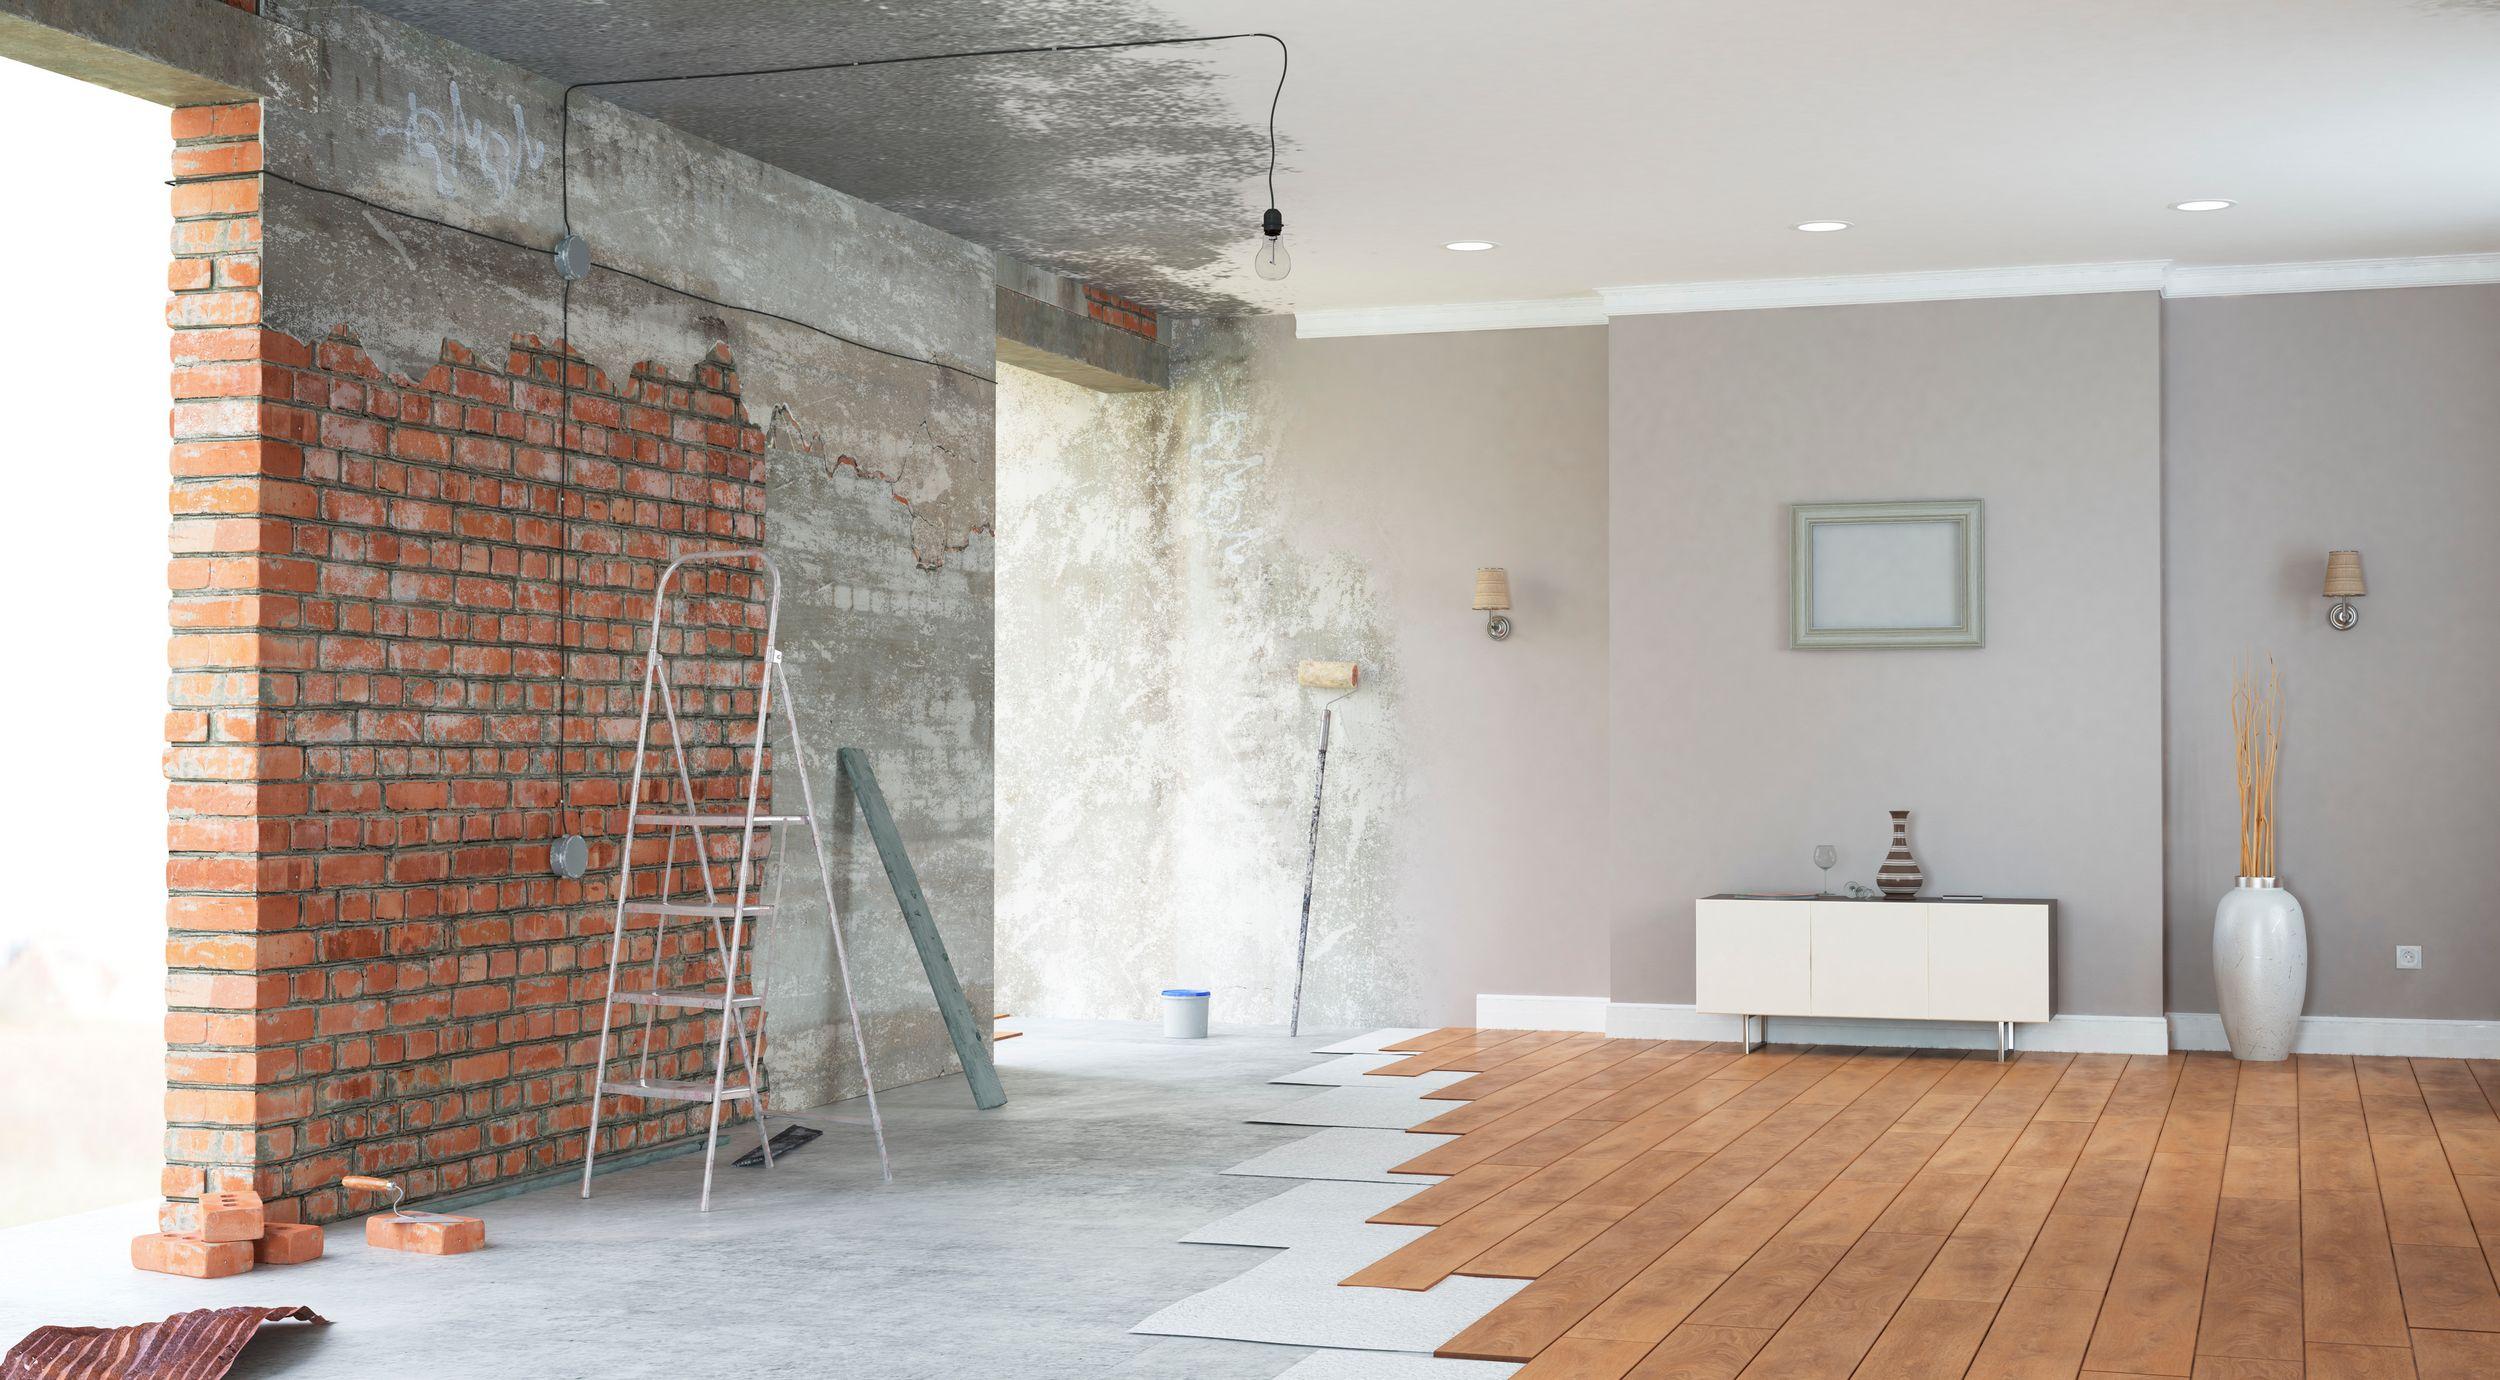 Renovation interior with bright windows. 3D render